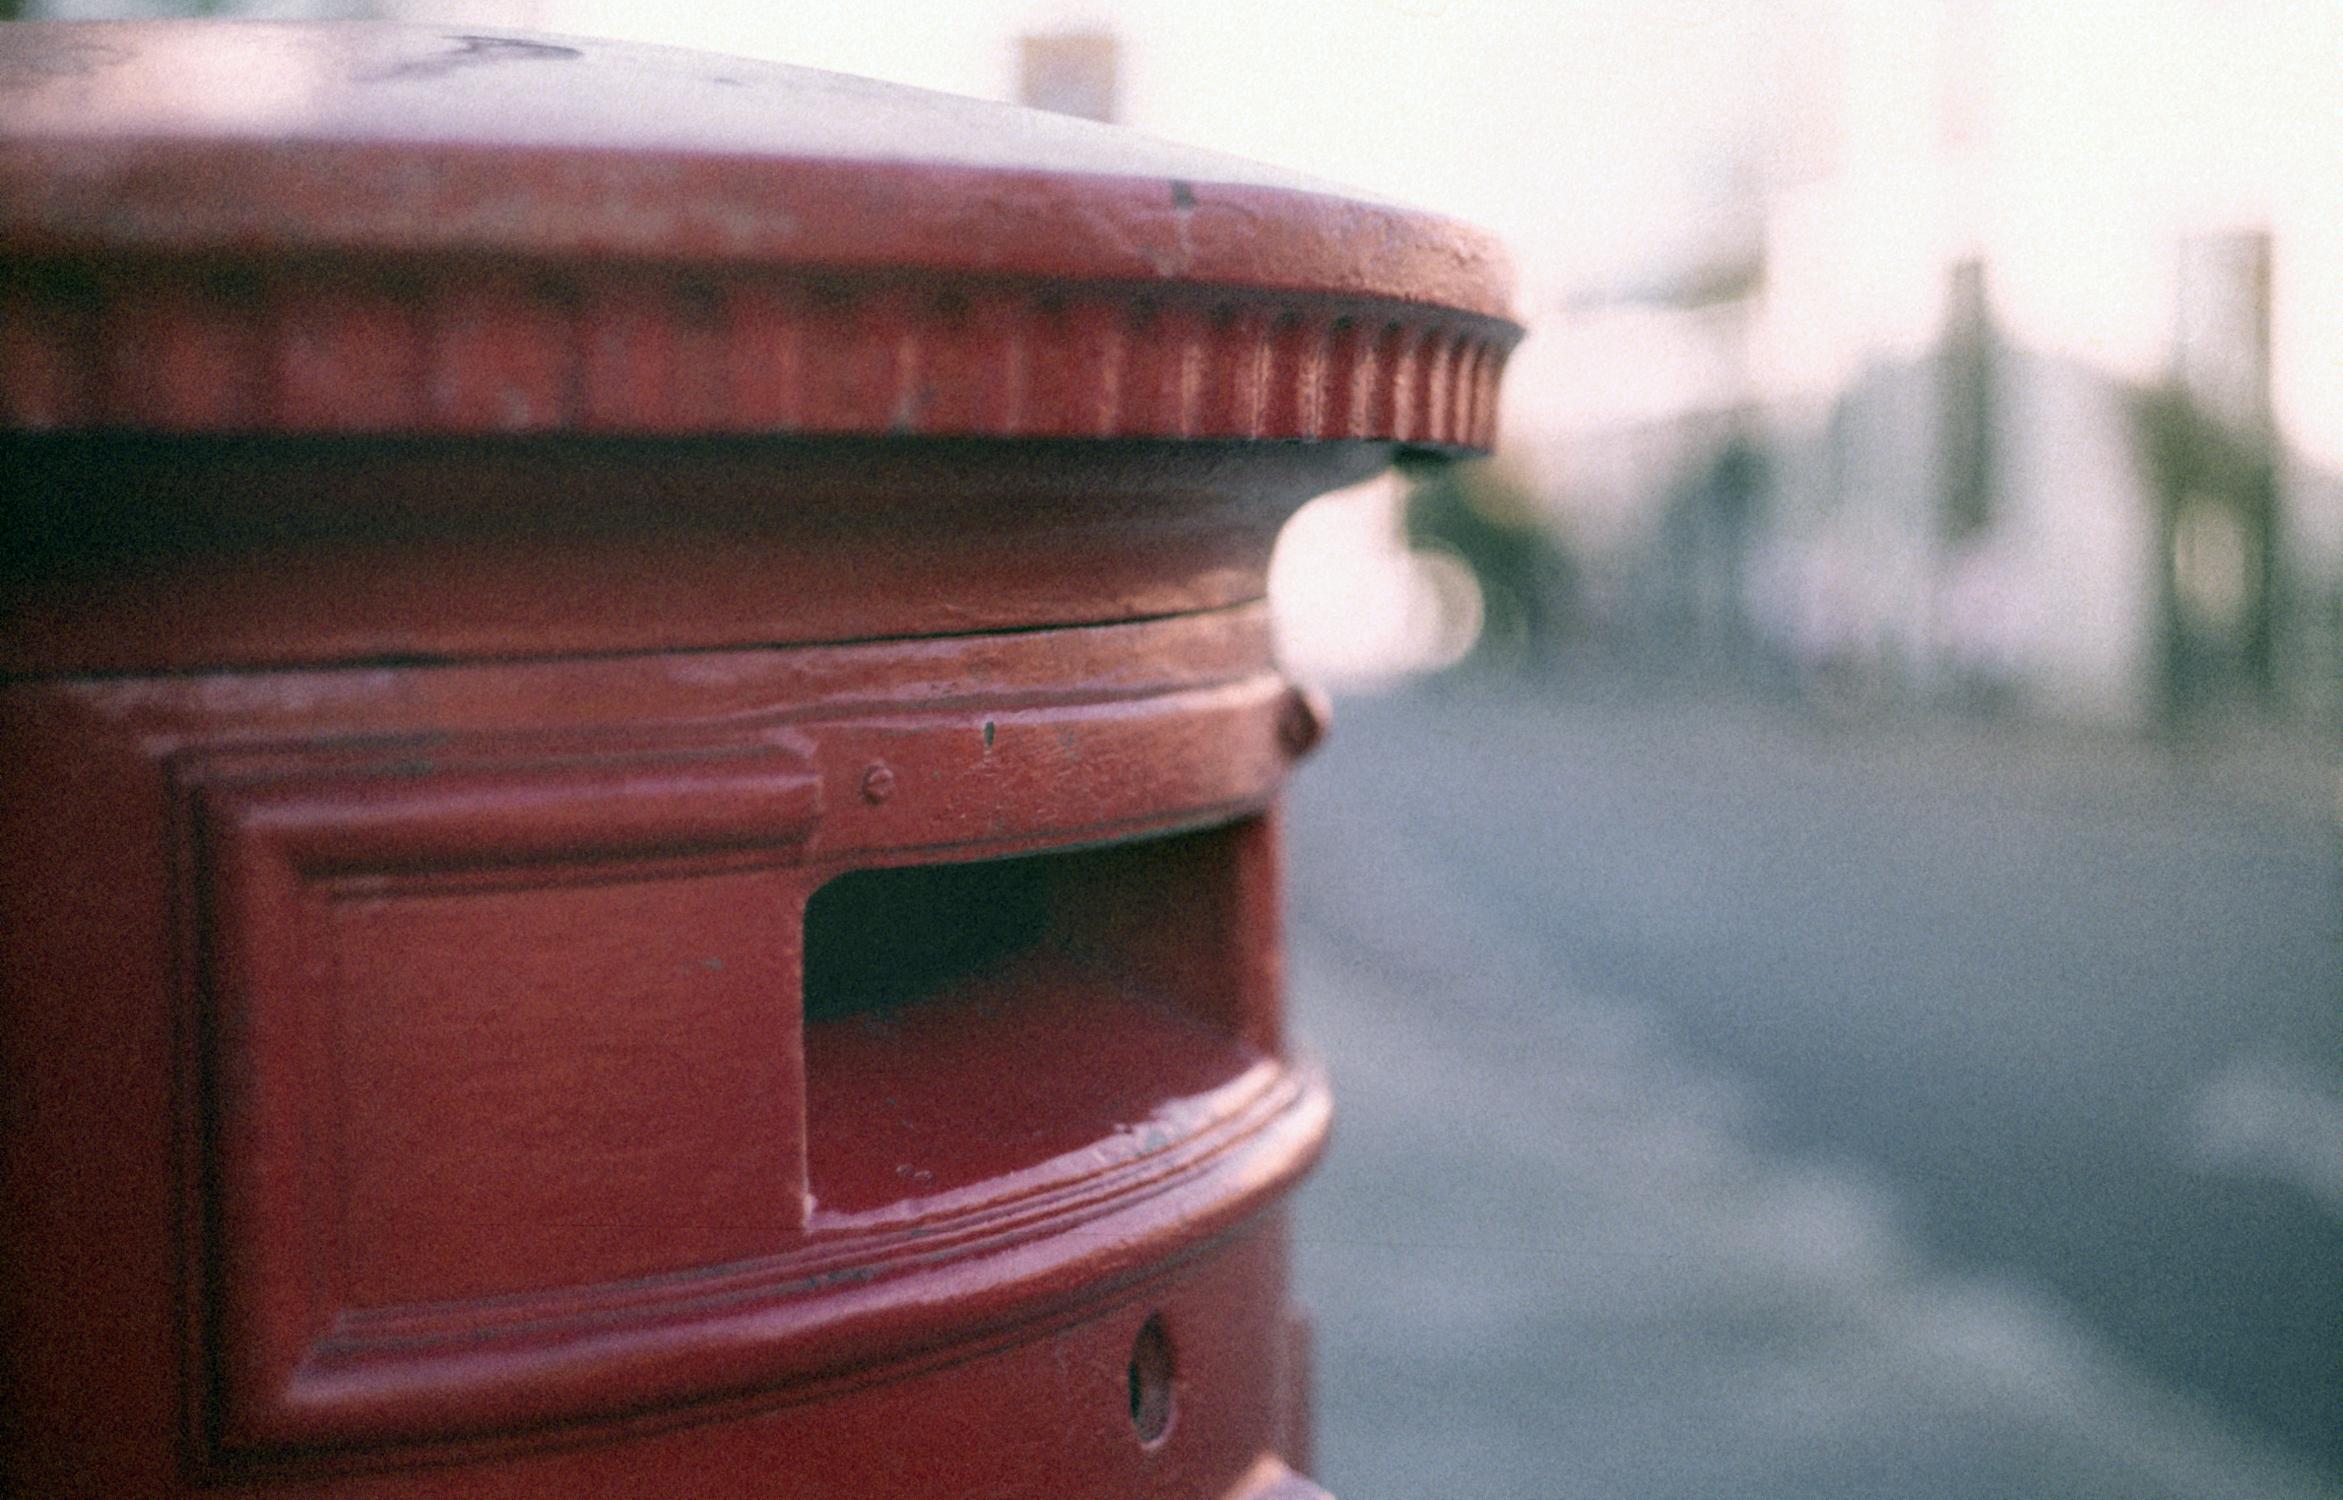 Postbox slot (Pic: Stephen Dowling)